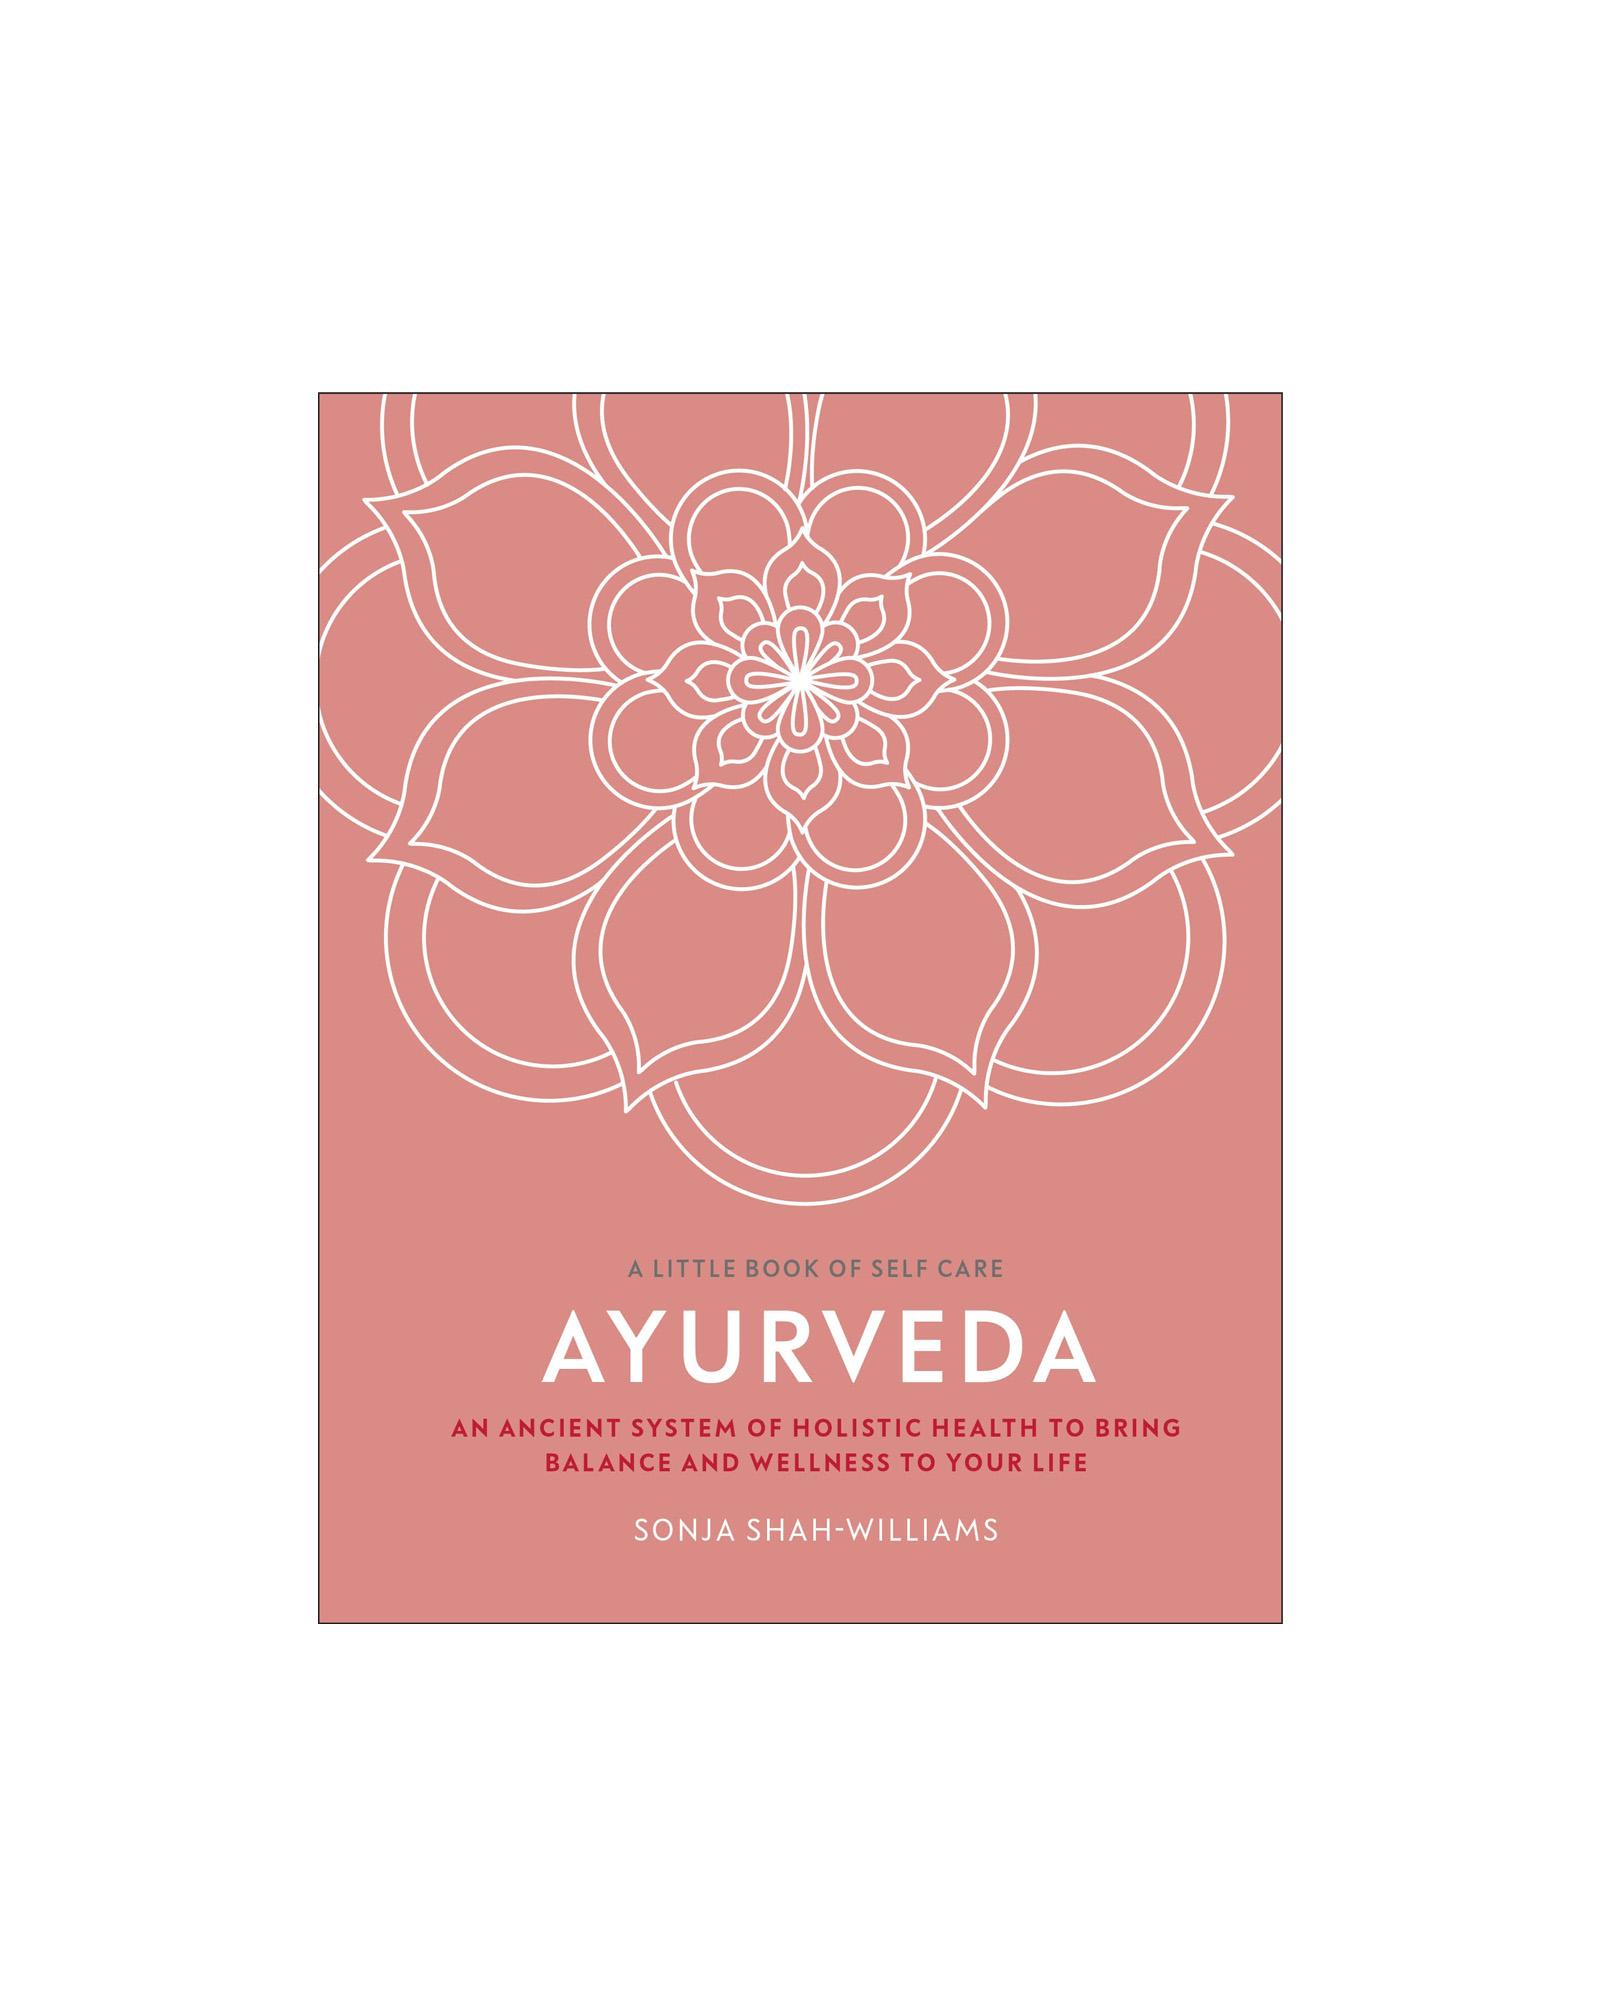 Little Book of Self Care: Ayurveda